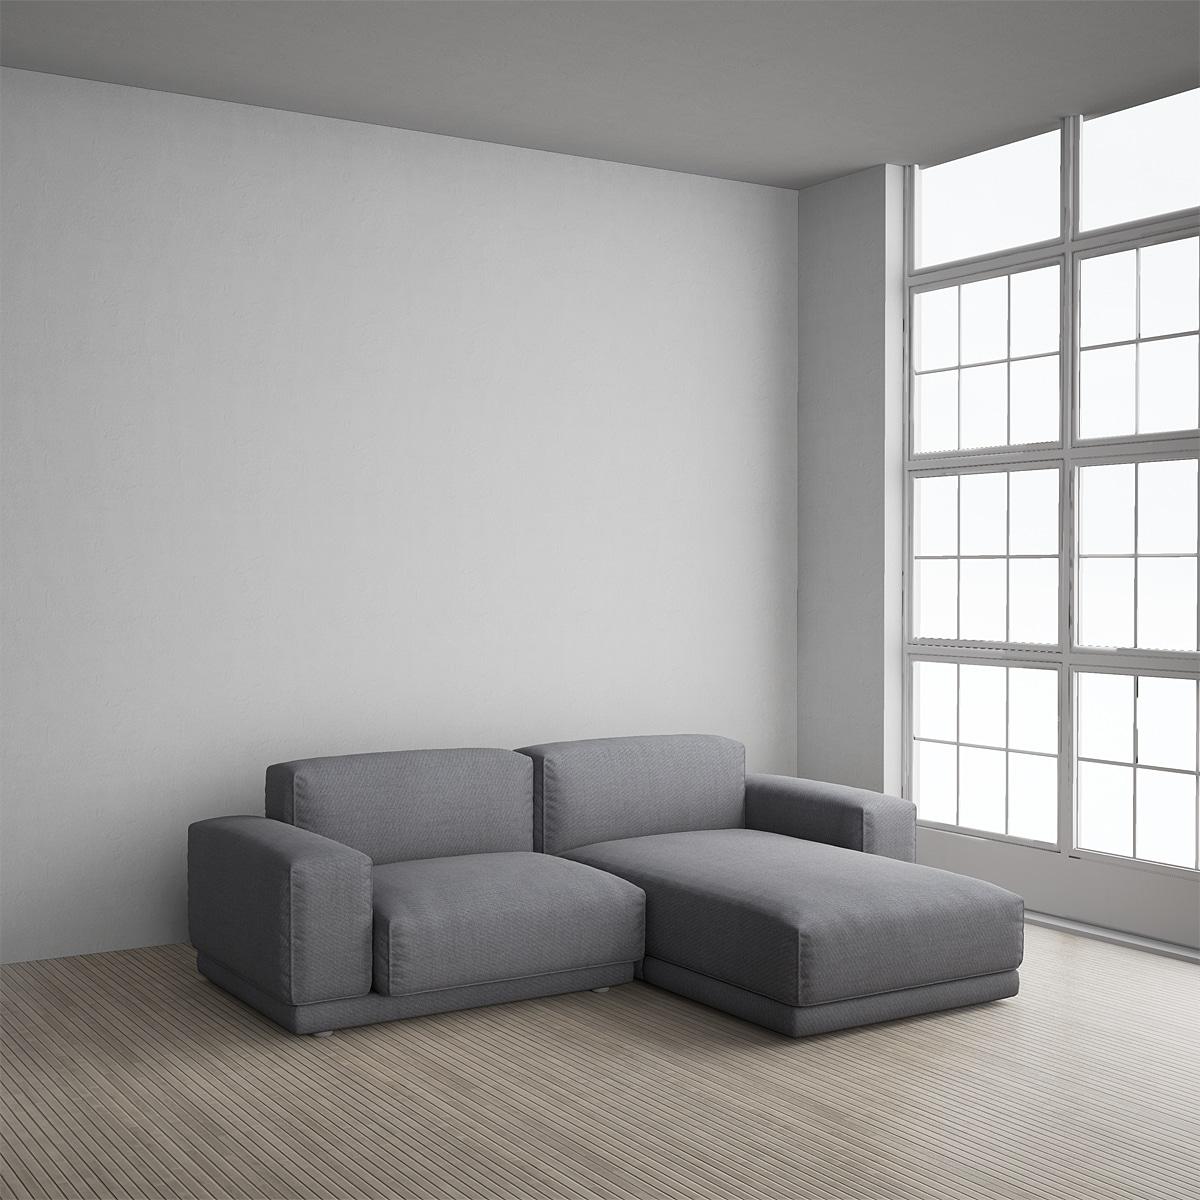 vitra collage sofa 03 ue4arch. Black Bedroom Furniture Sets. Home Design Ideas